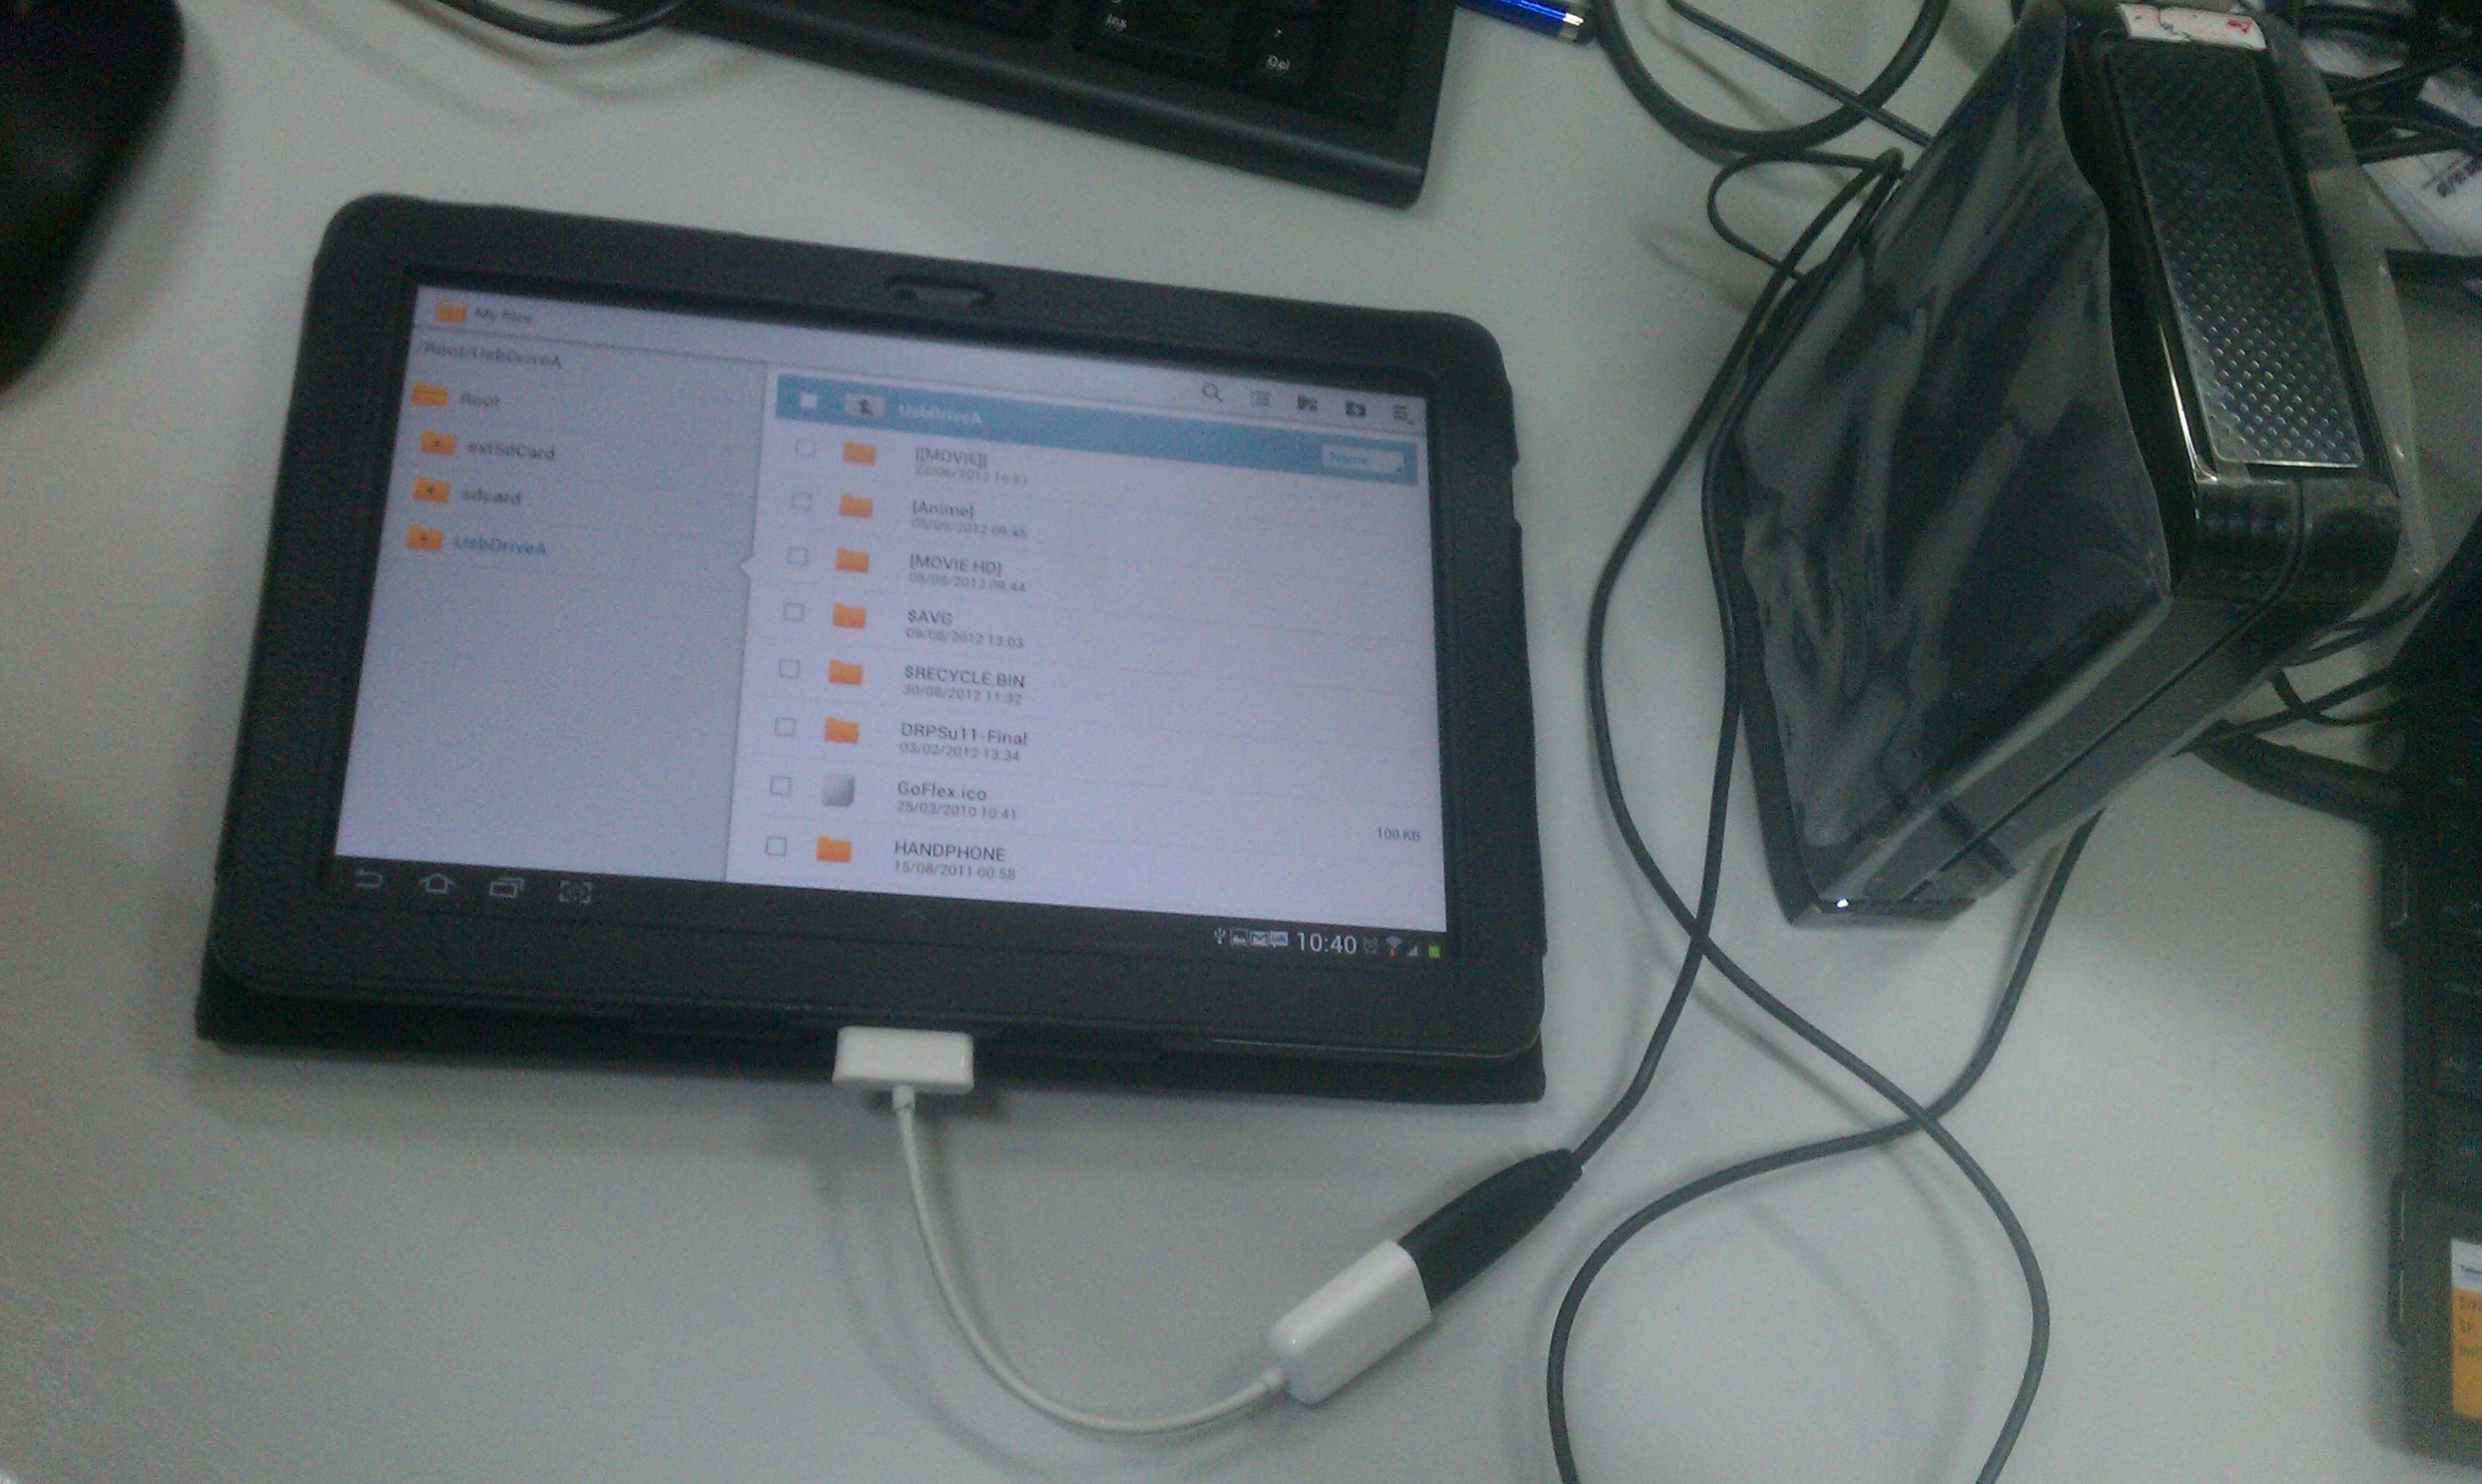 Nonton TV di Android Tablet